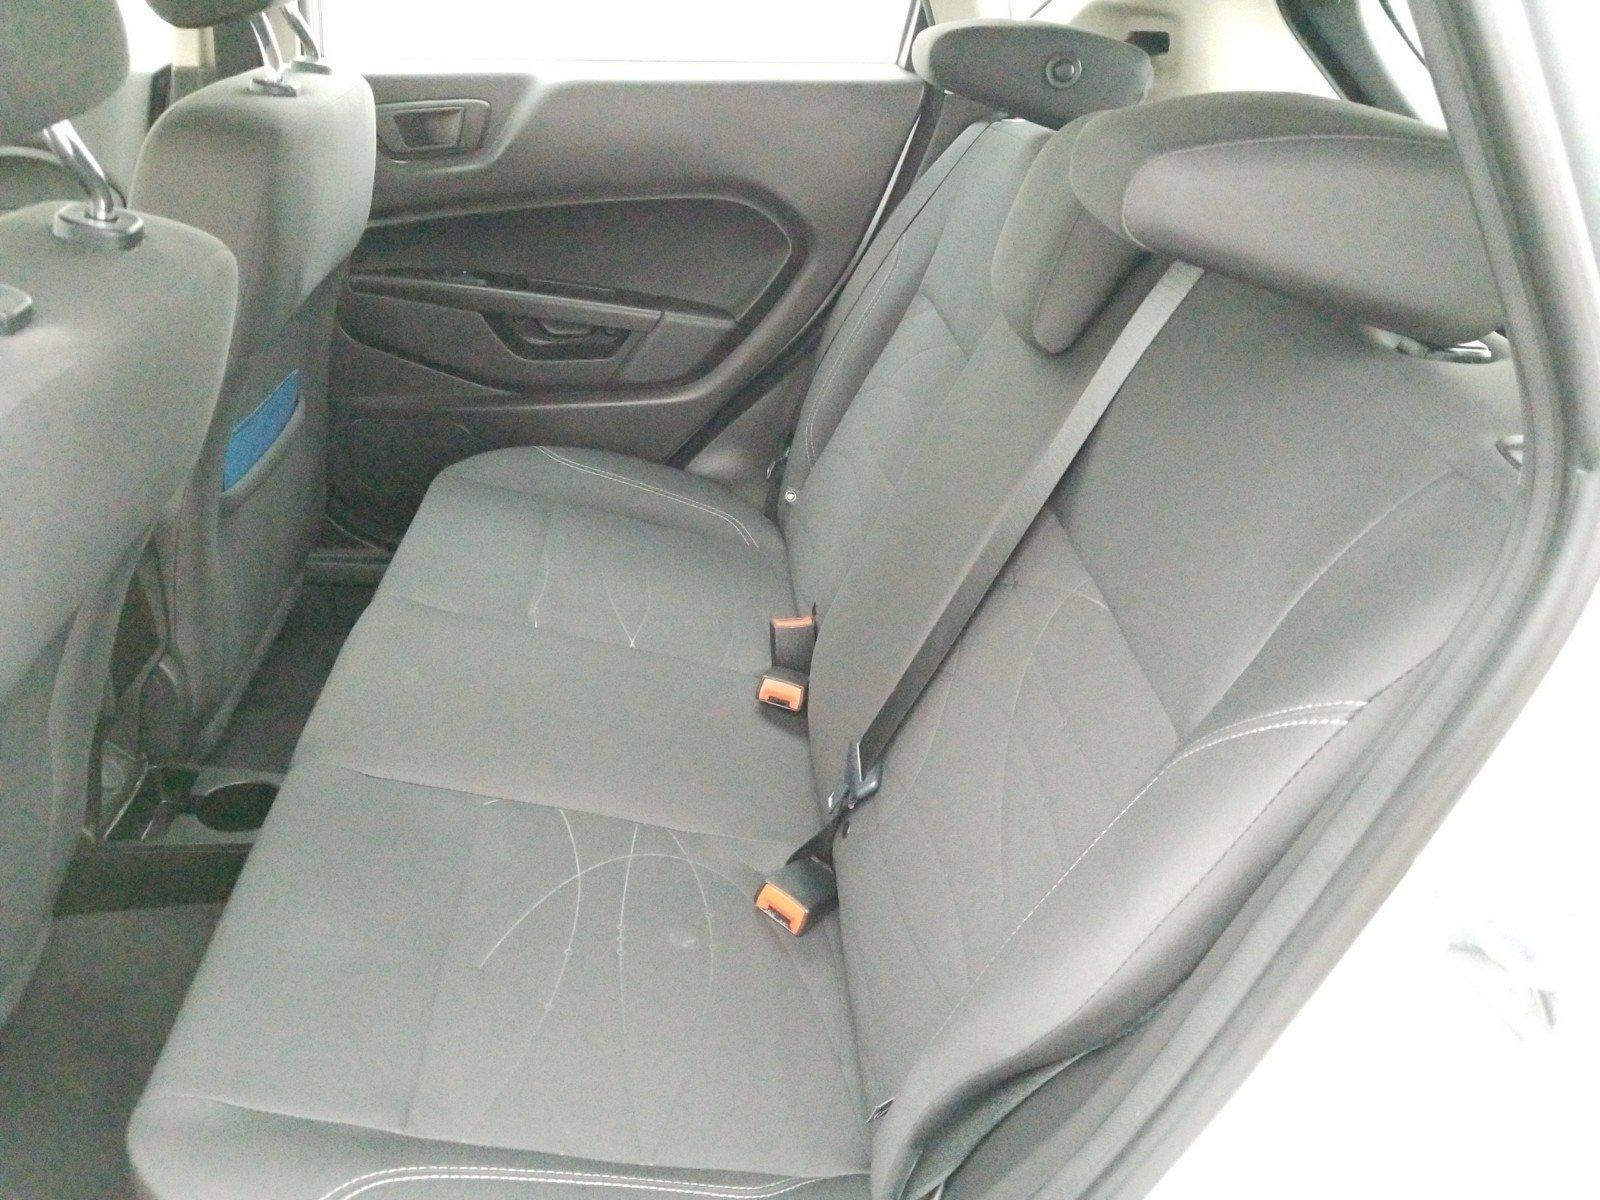 Used 2019 Ford Fiesta SE Hatchback for sale in Lincoln NE